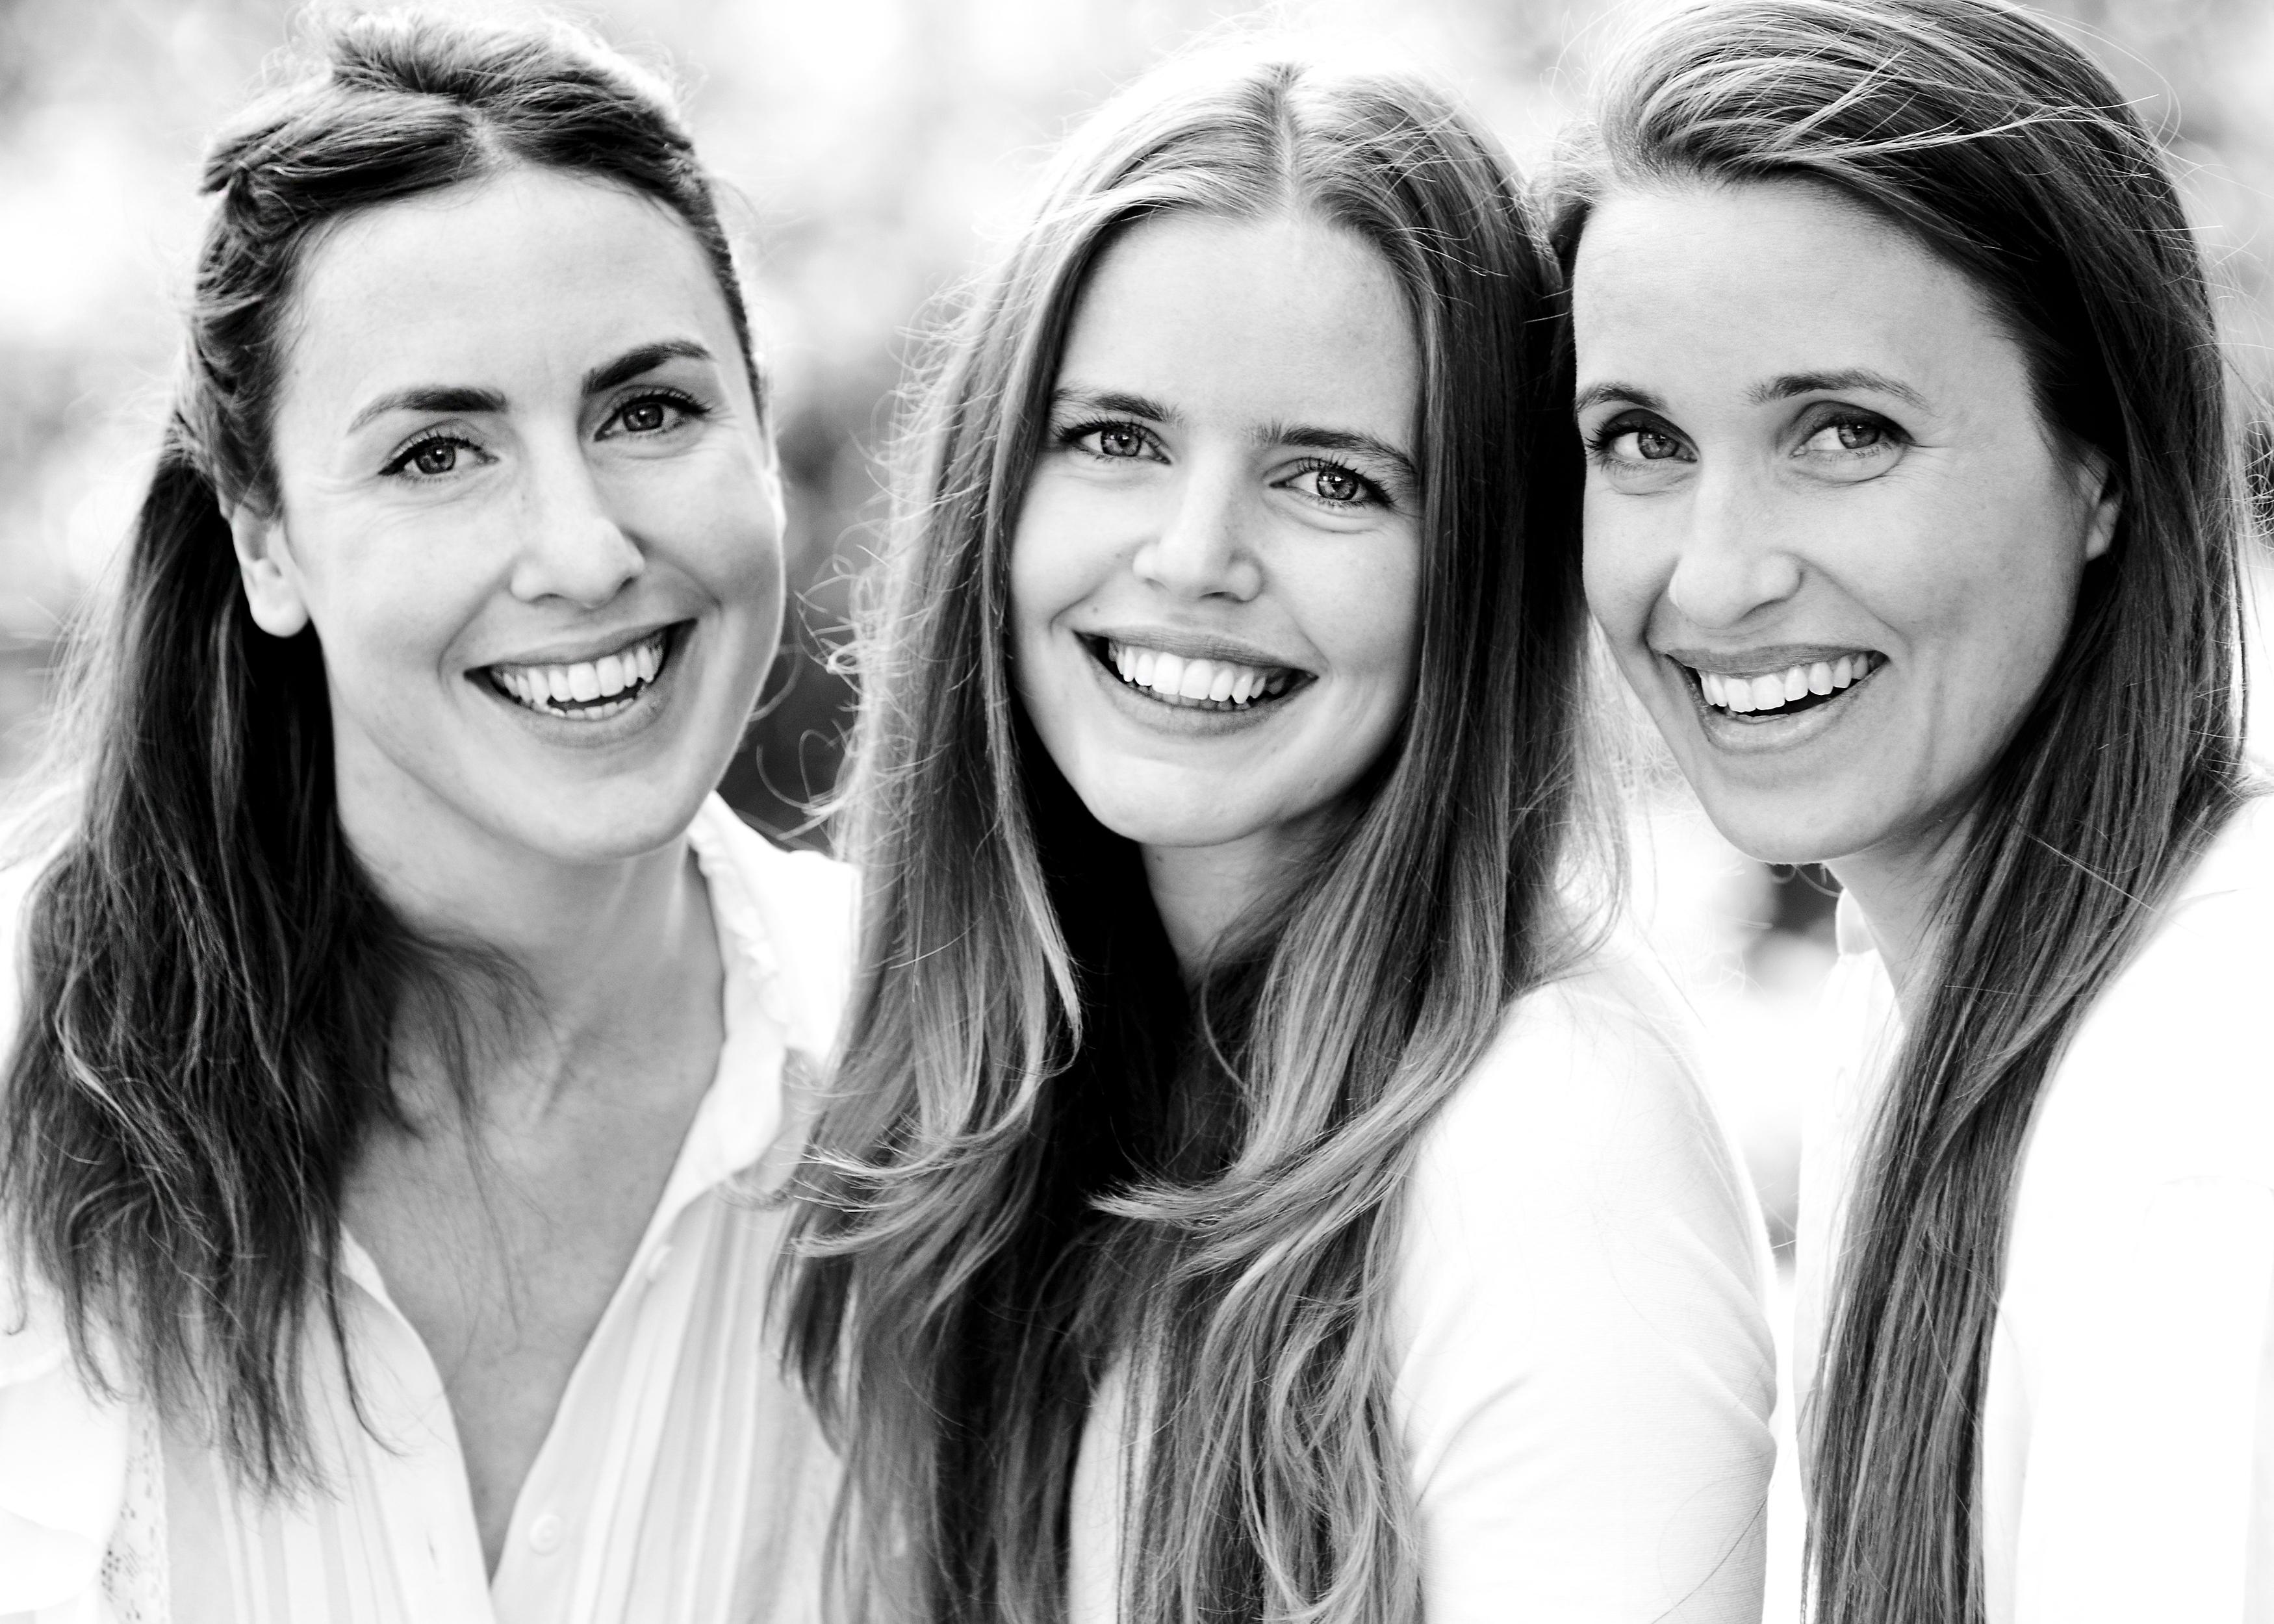 Readman sisters